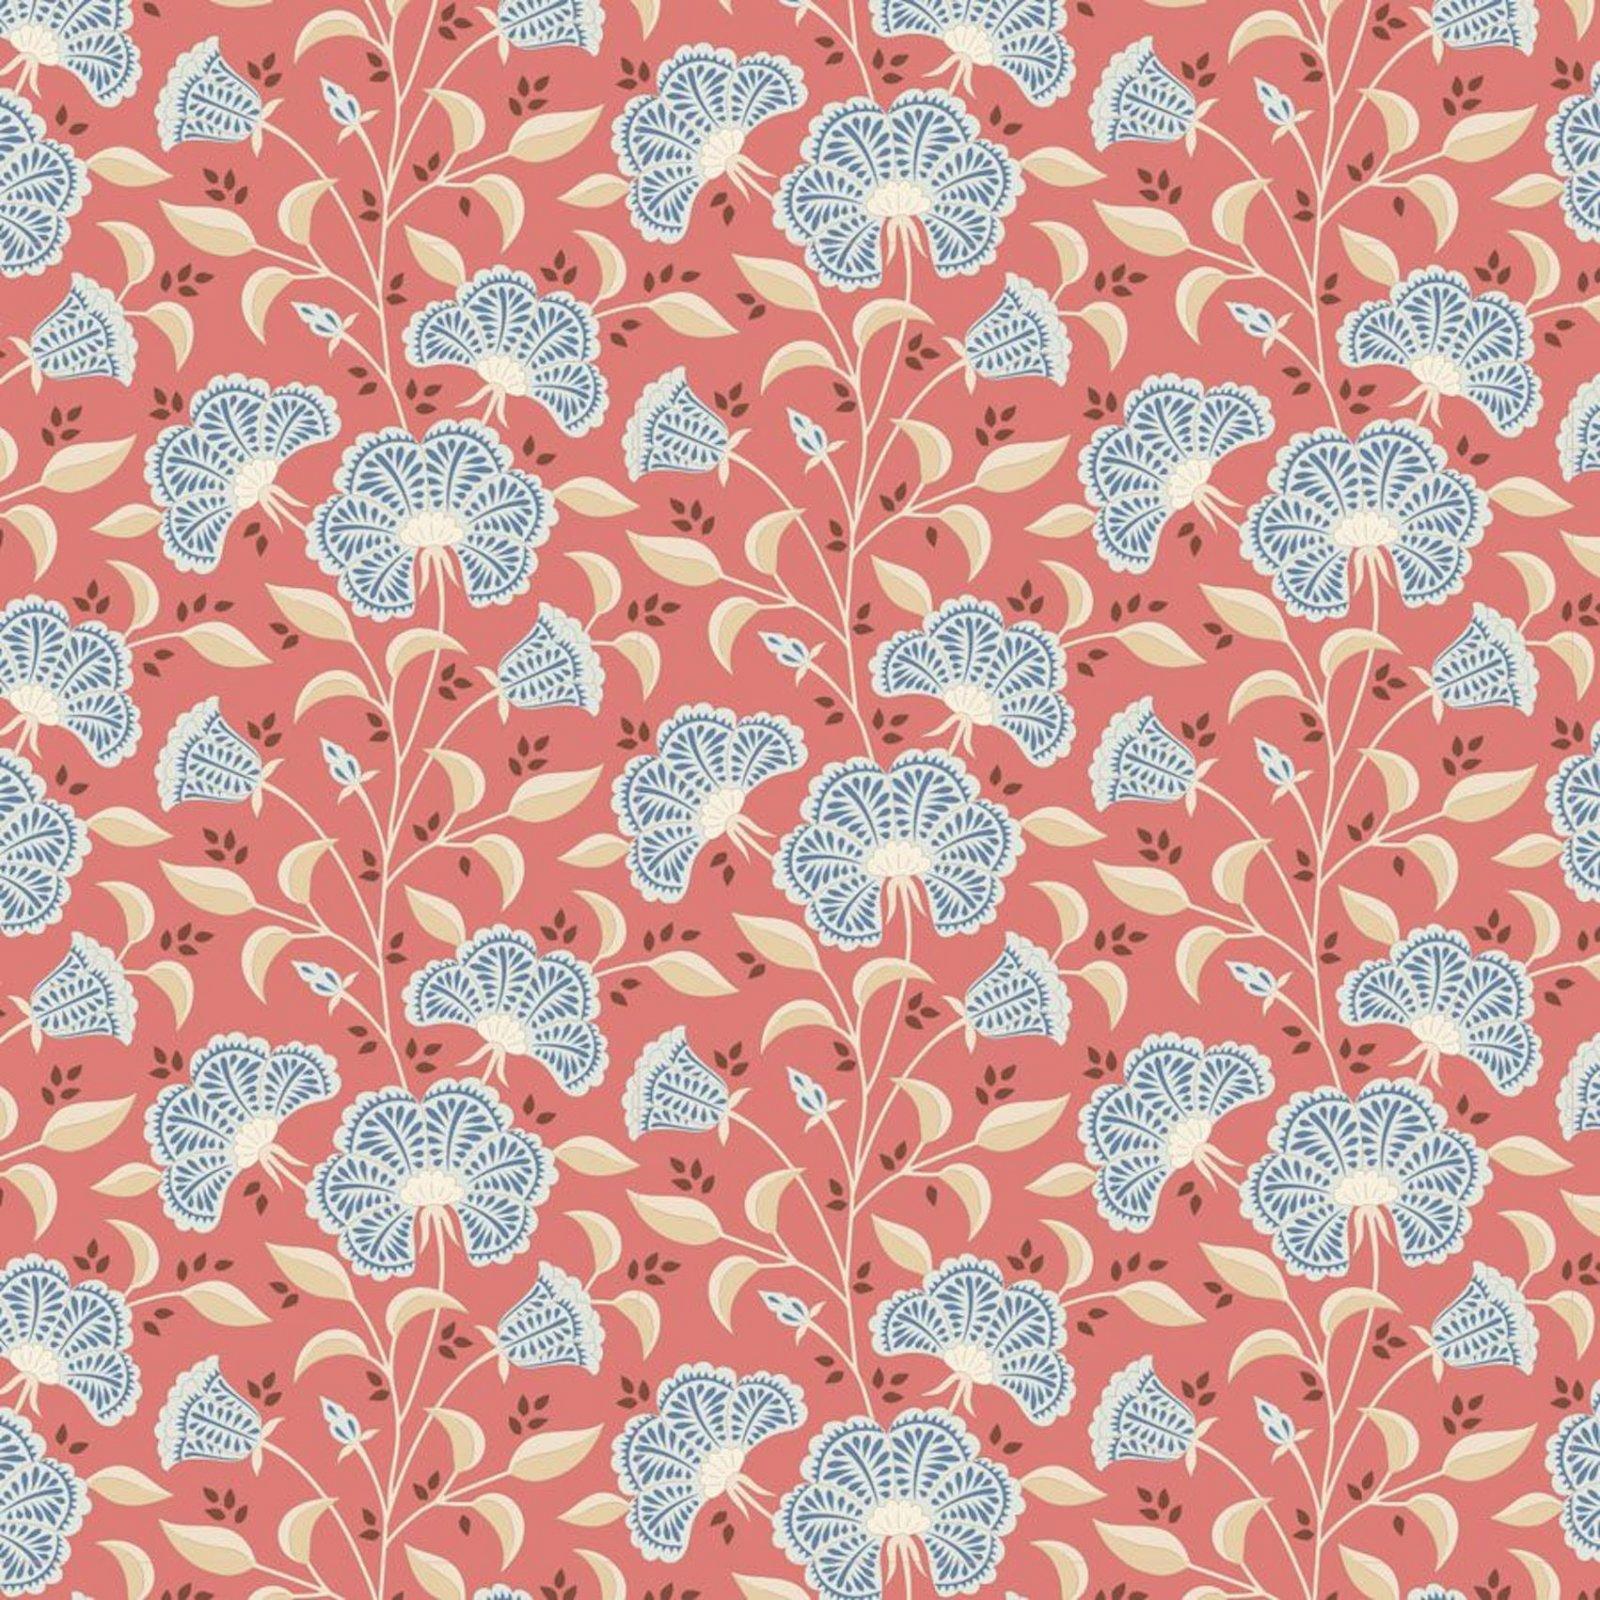 PRE-ORDER  - Tilda - Windy Days - Stormy Floral Coral